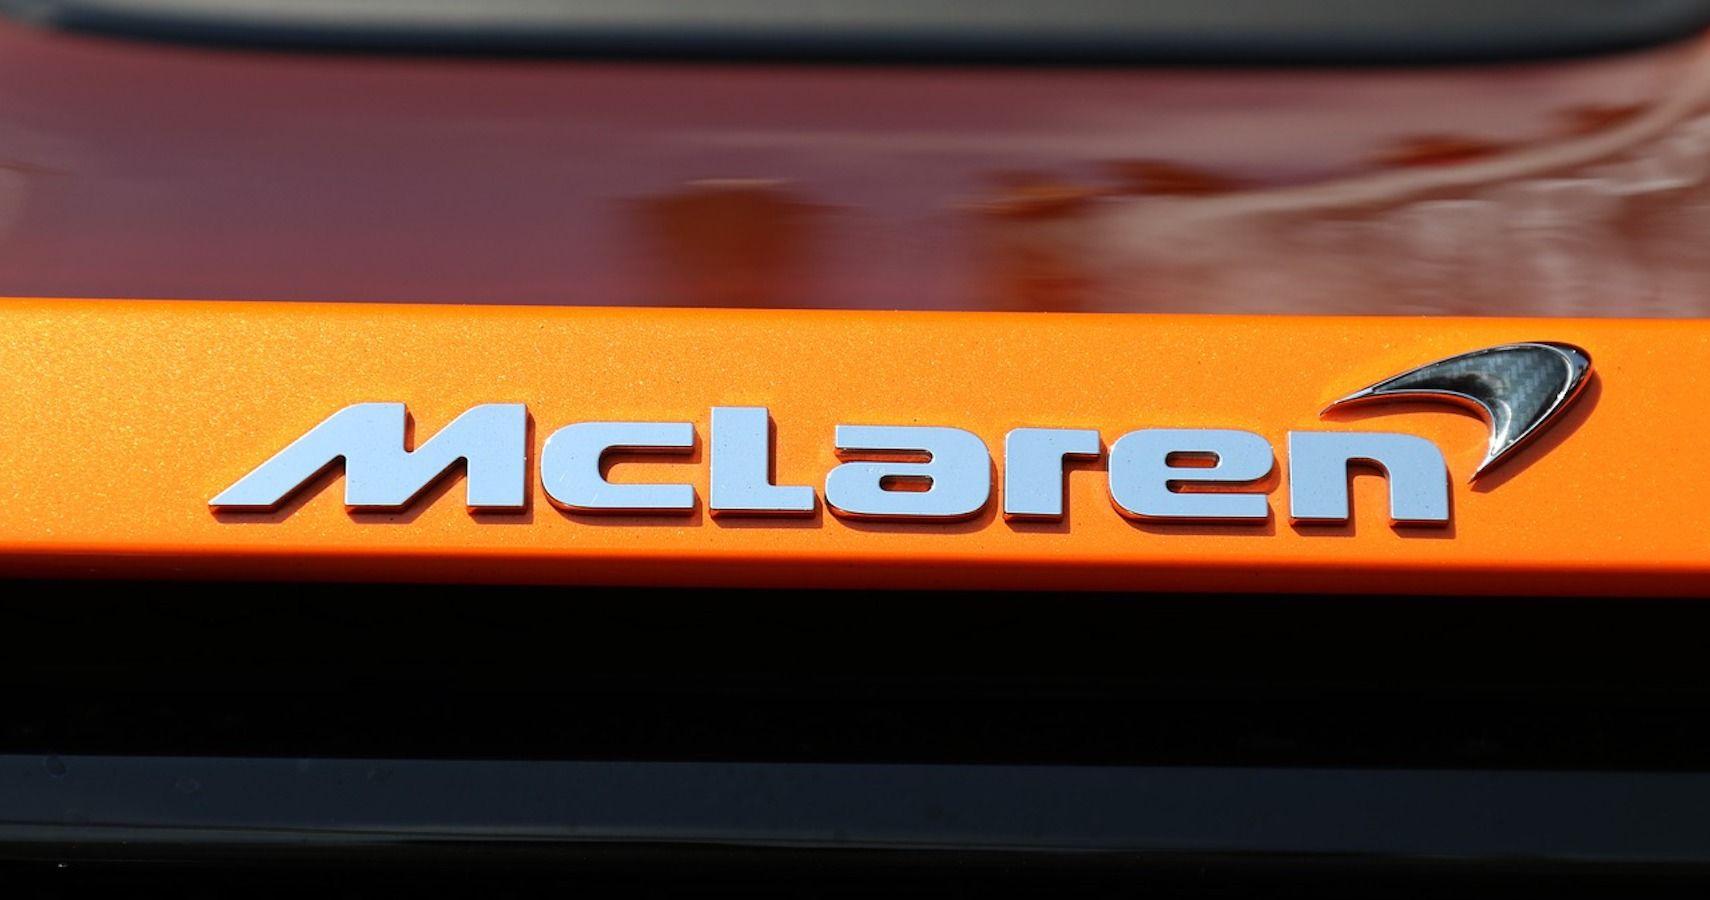 McLaren Secures A Spot On The 2022 Formula E Grid | HotCars